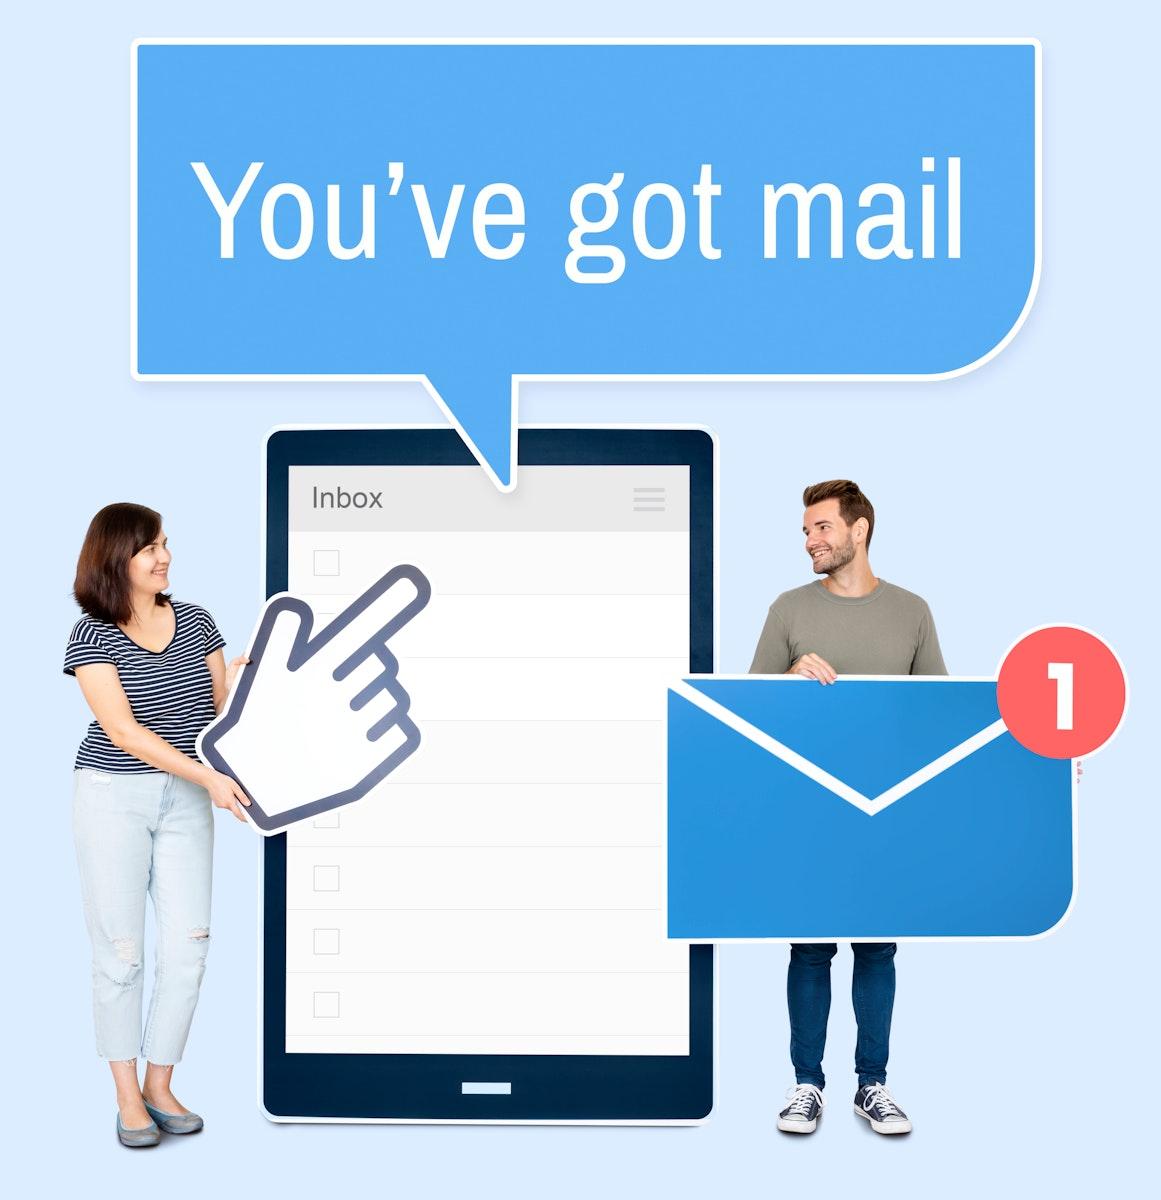 People sending an e-mail via a tablet